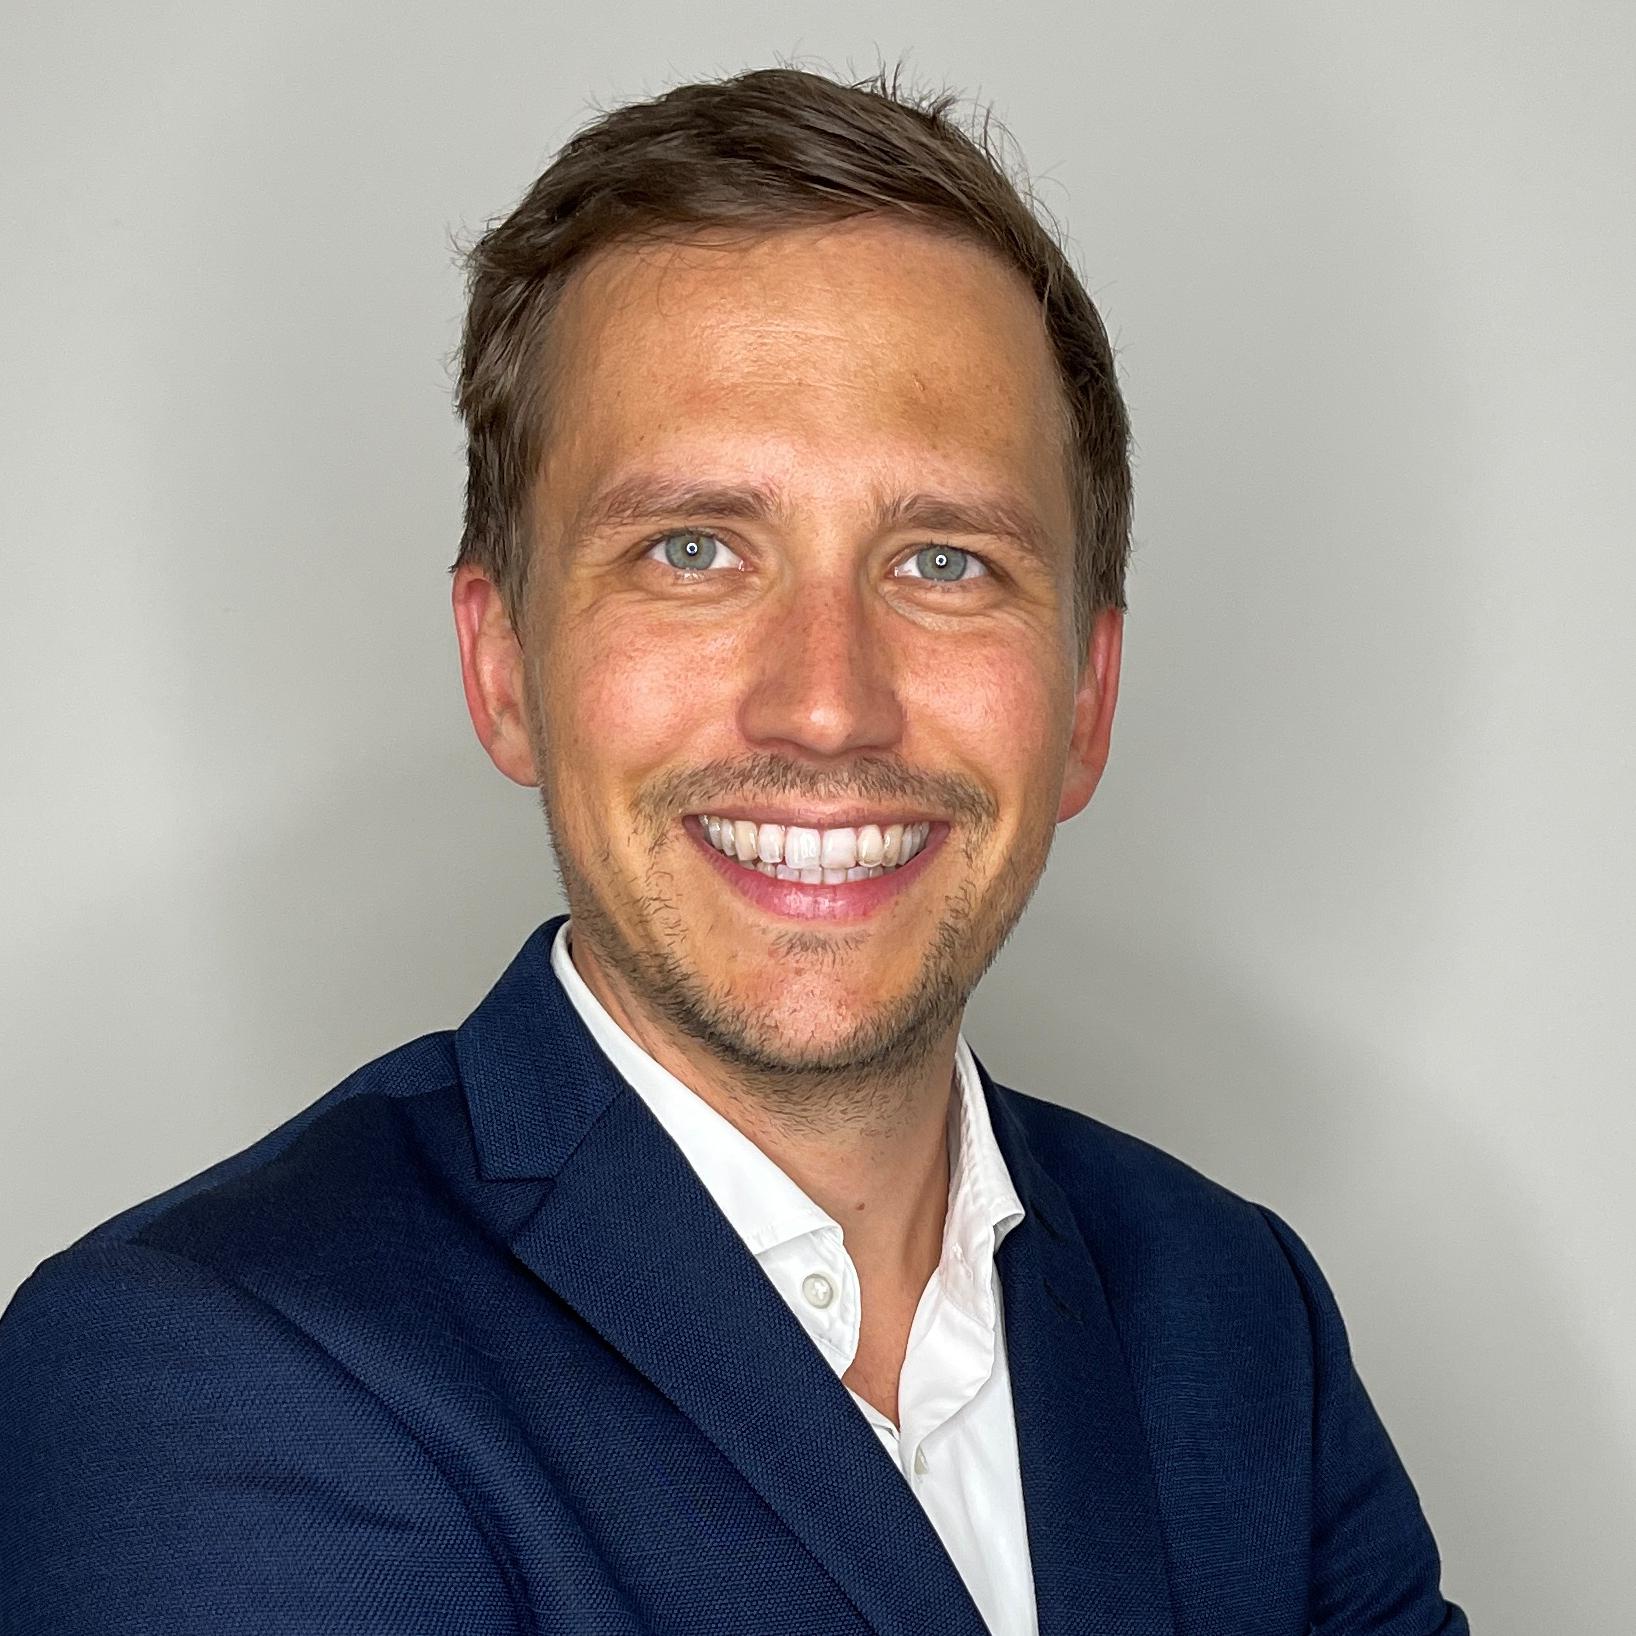 Stefan Brinkhoff